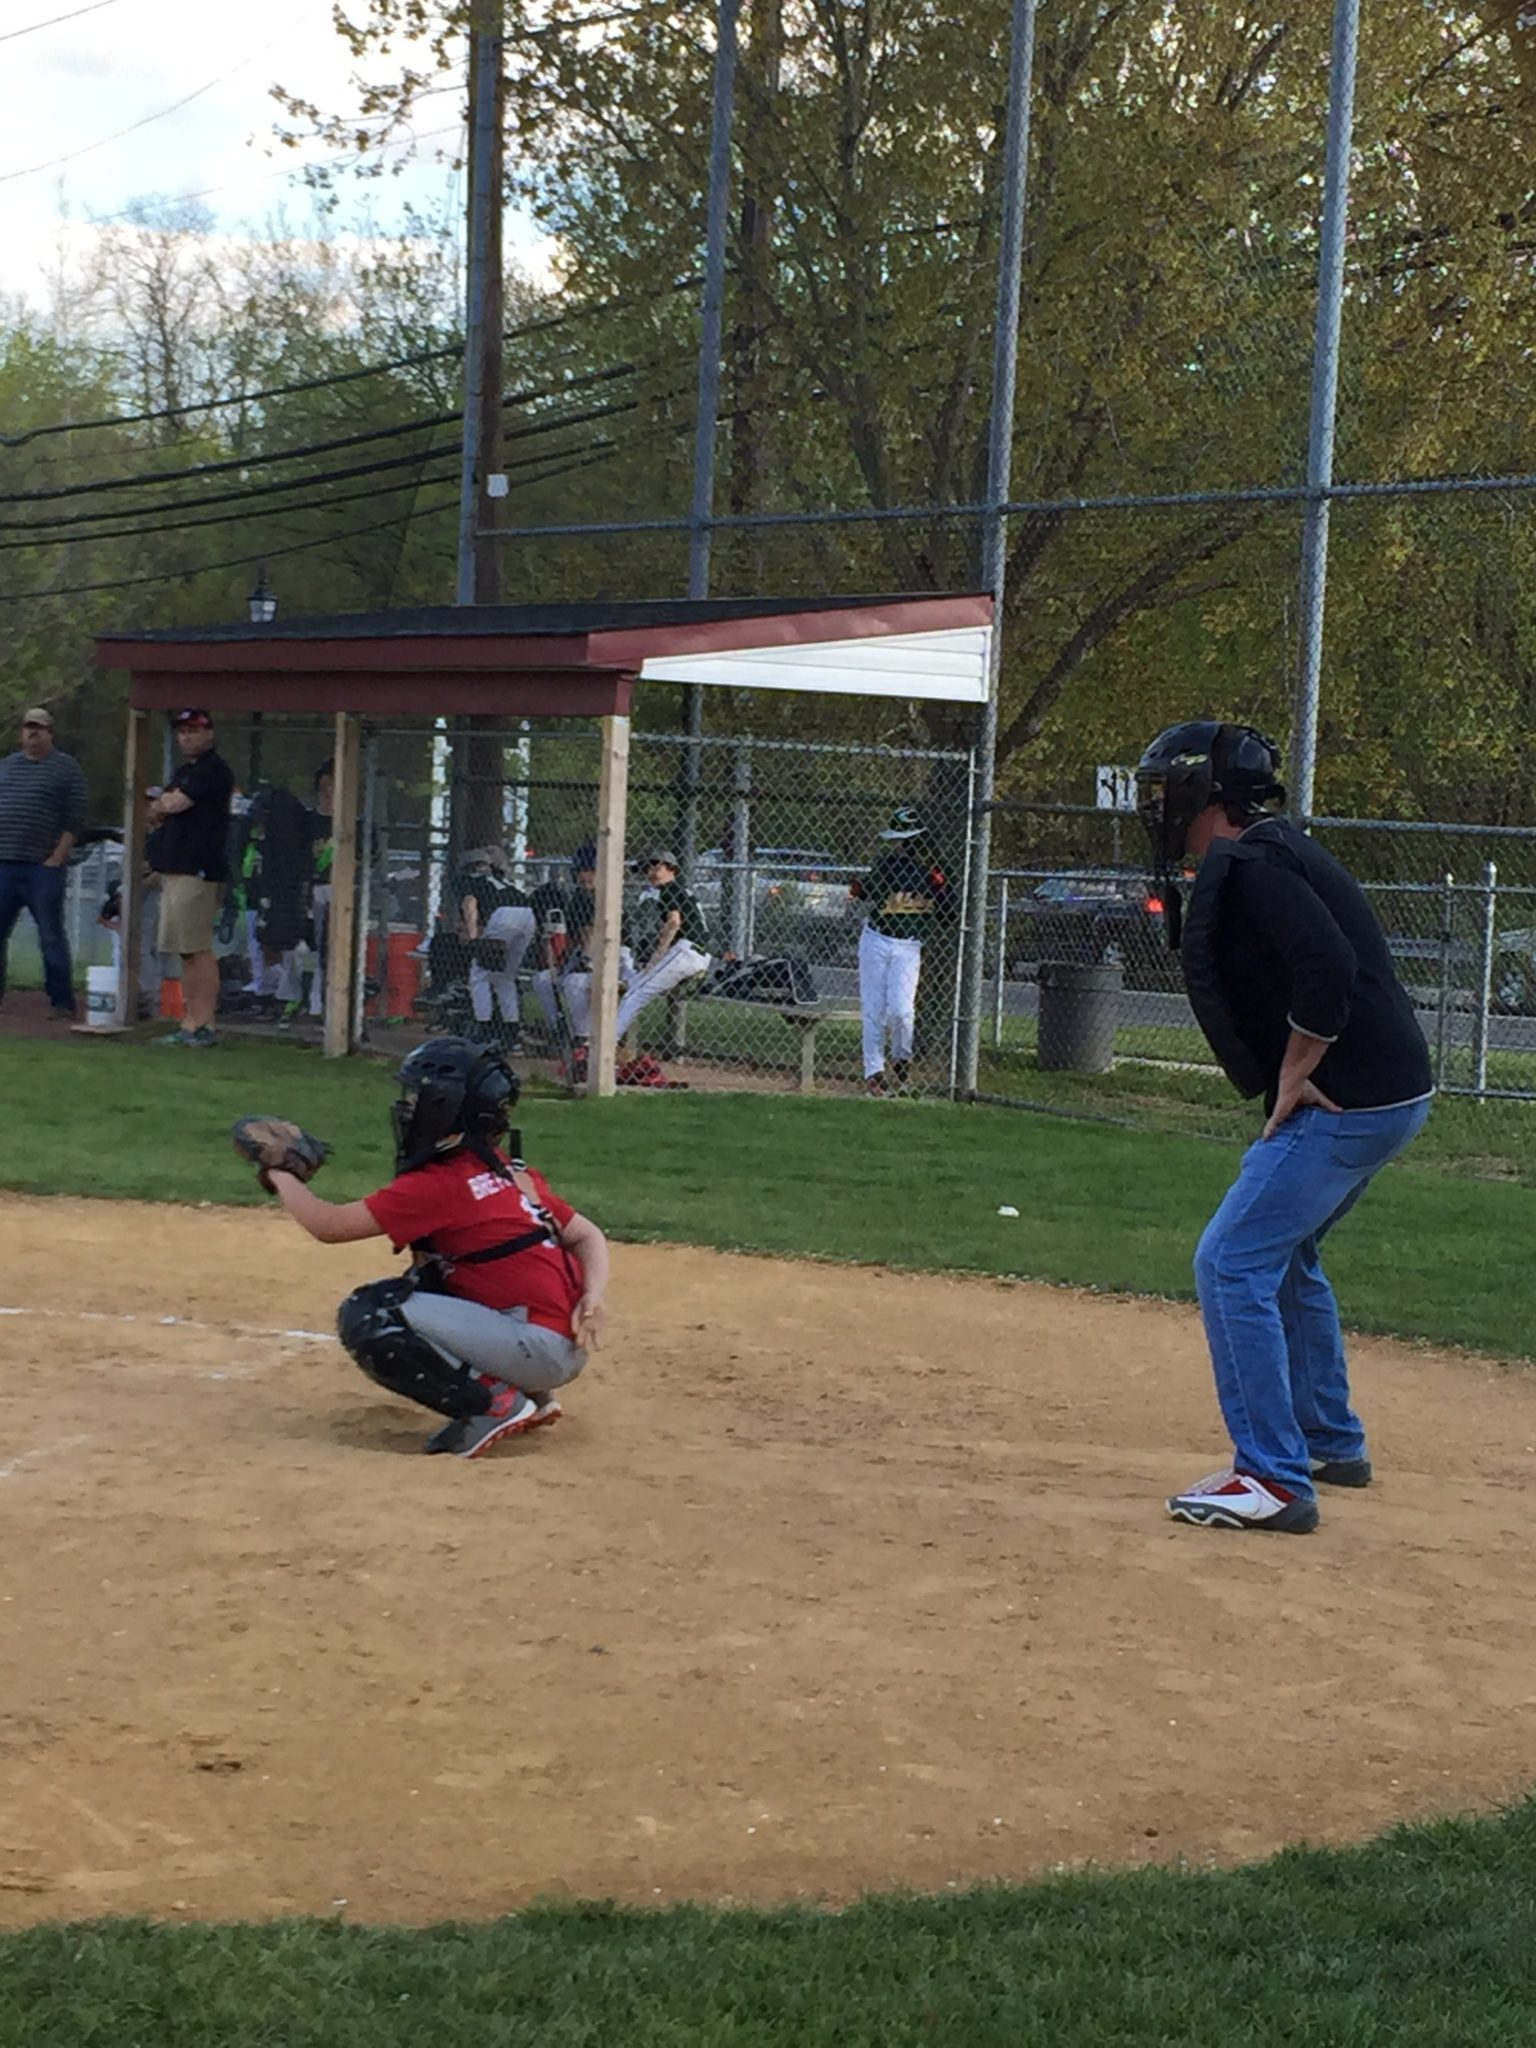 My Dad Is Umpire??